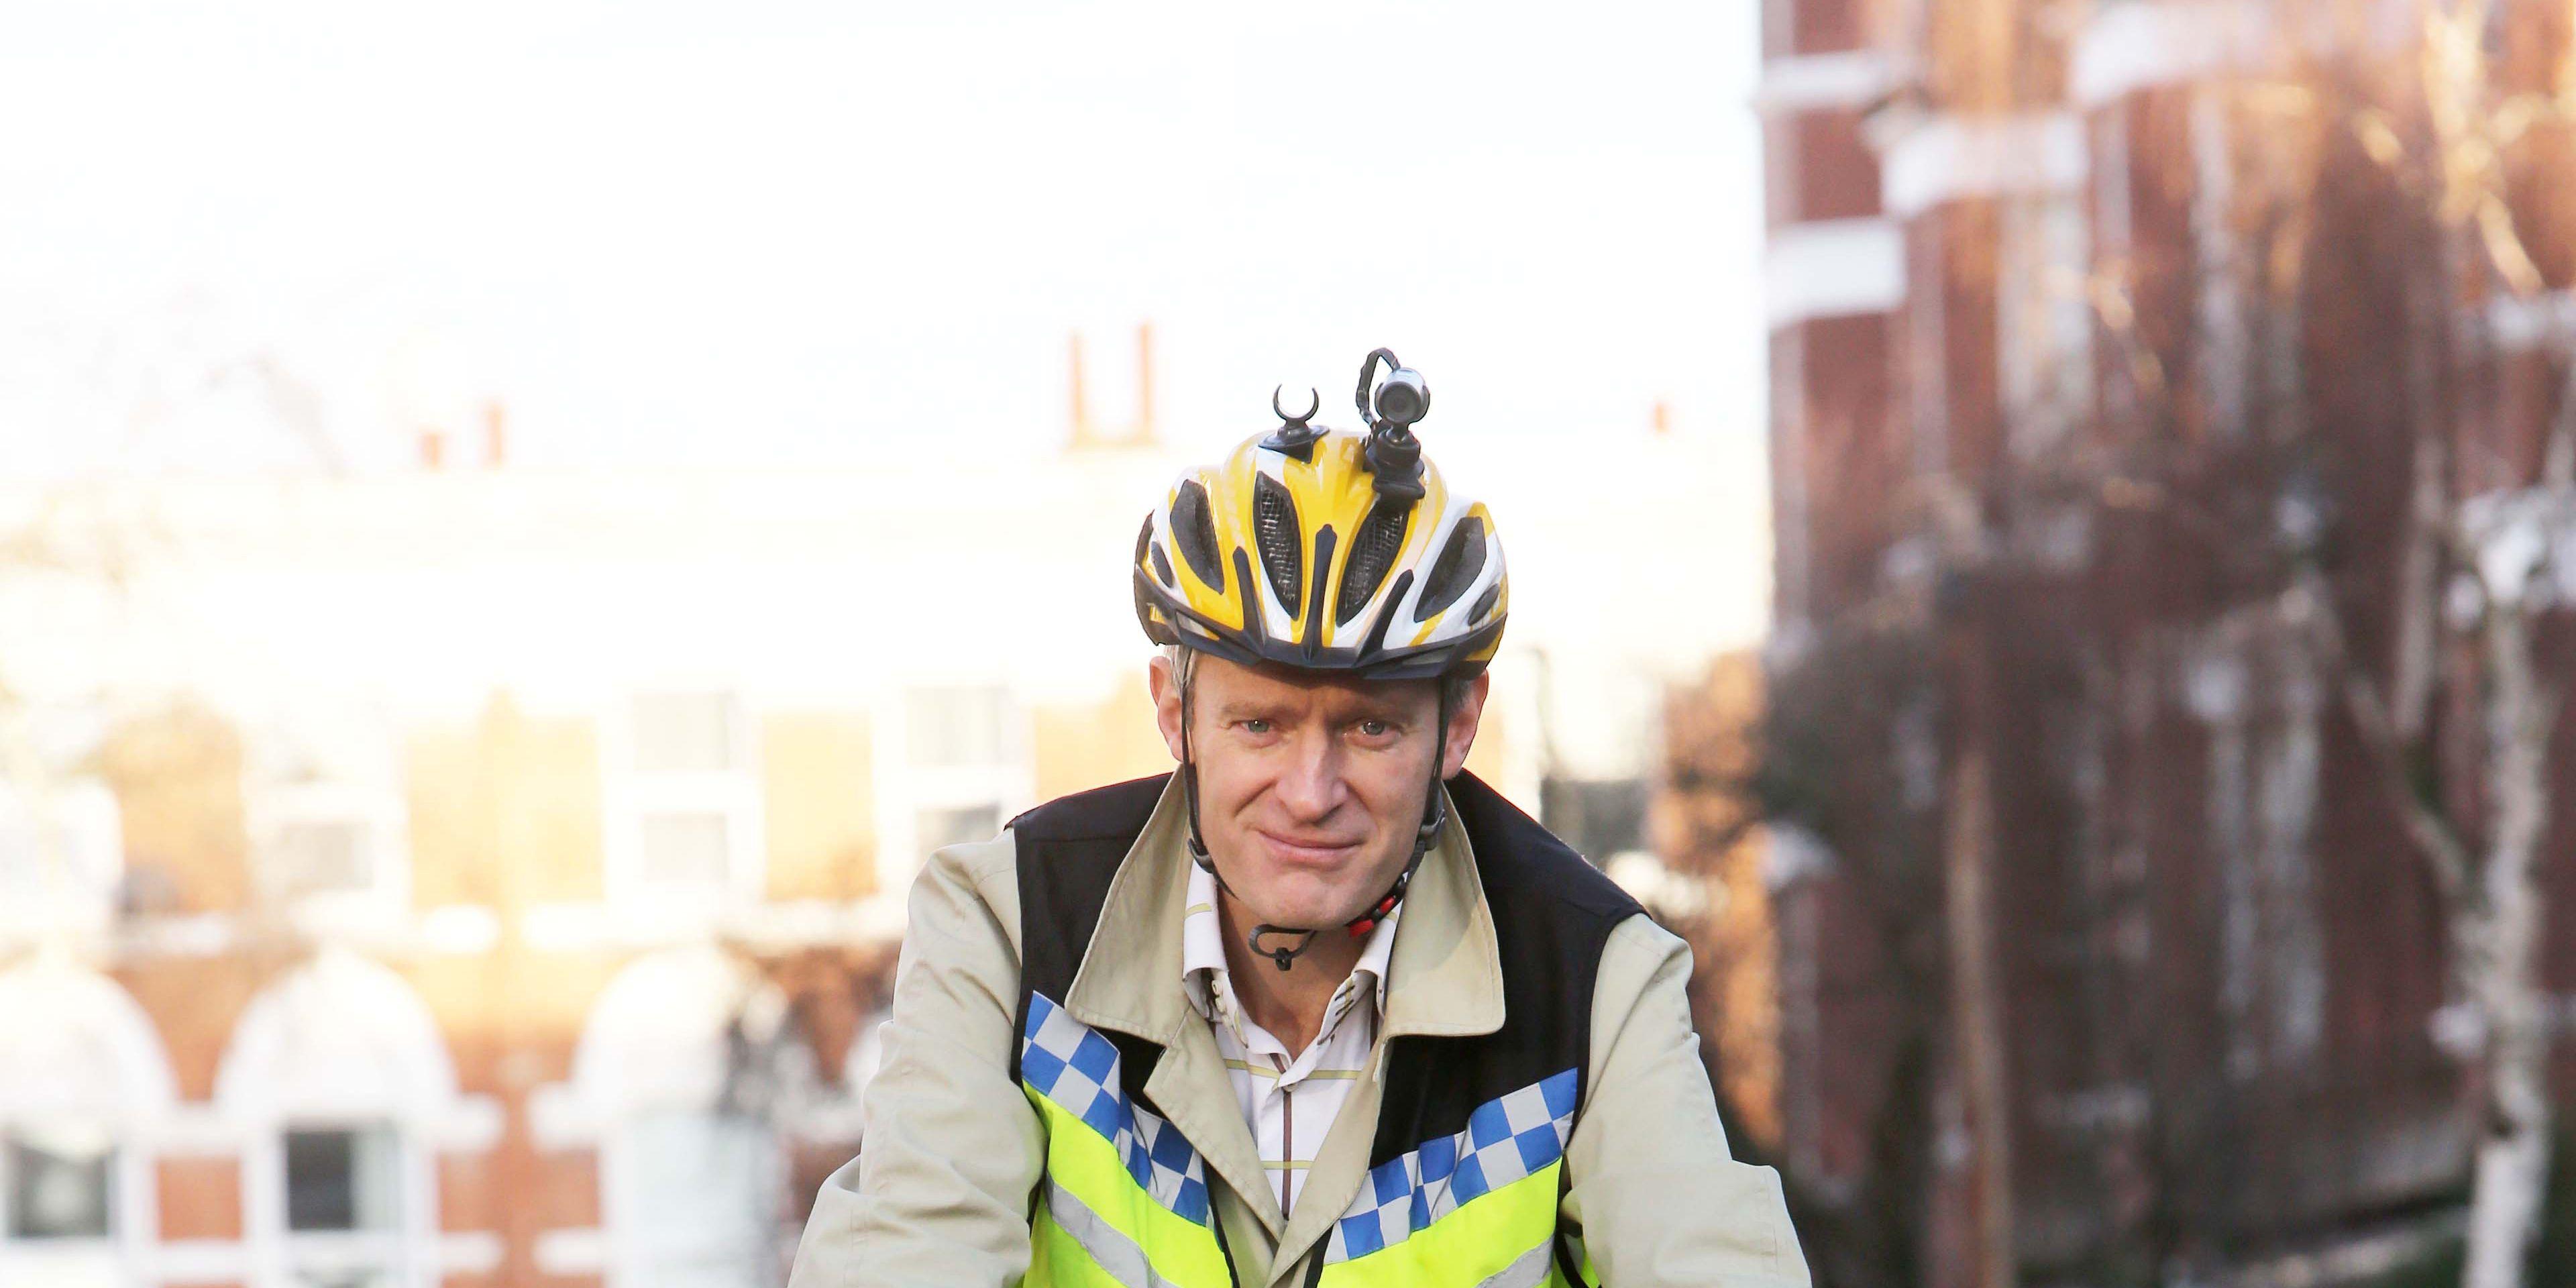 BBC presenter, Jeremy Vine, cycling